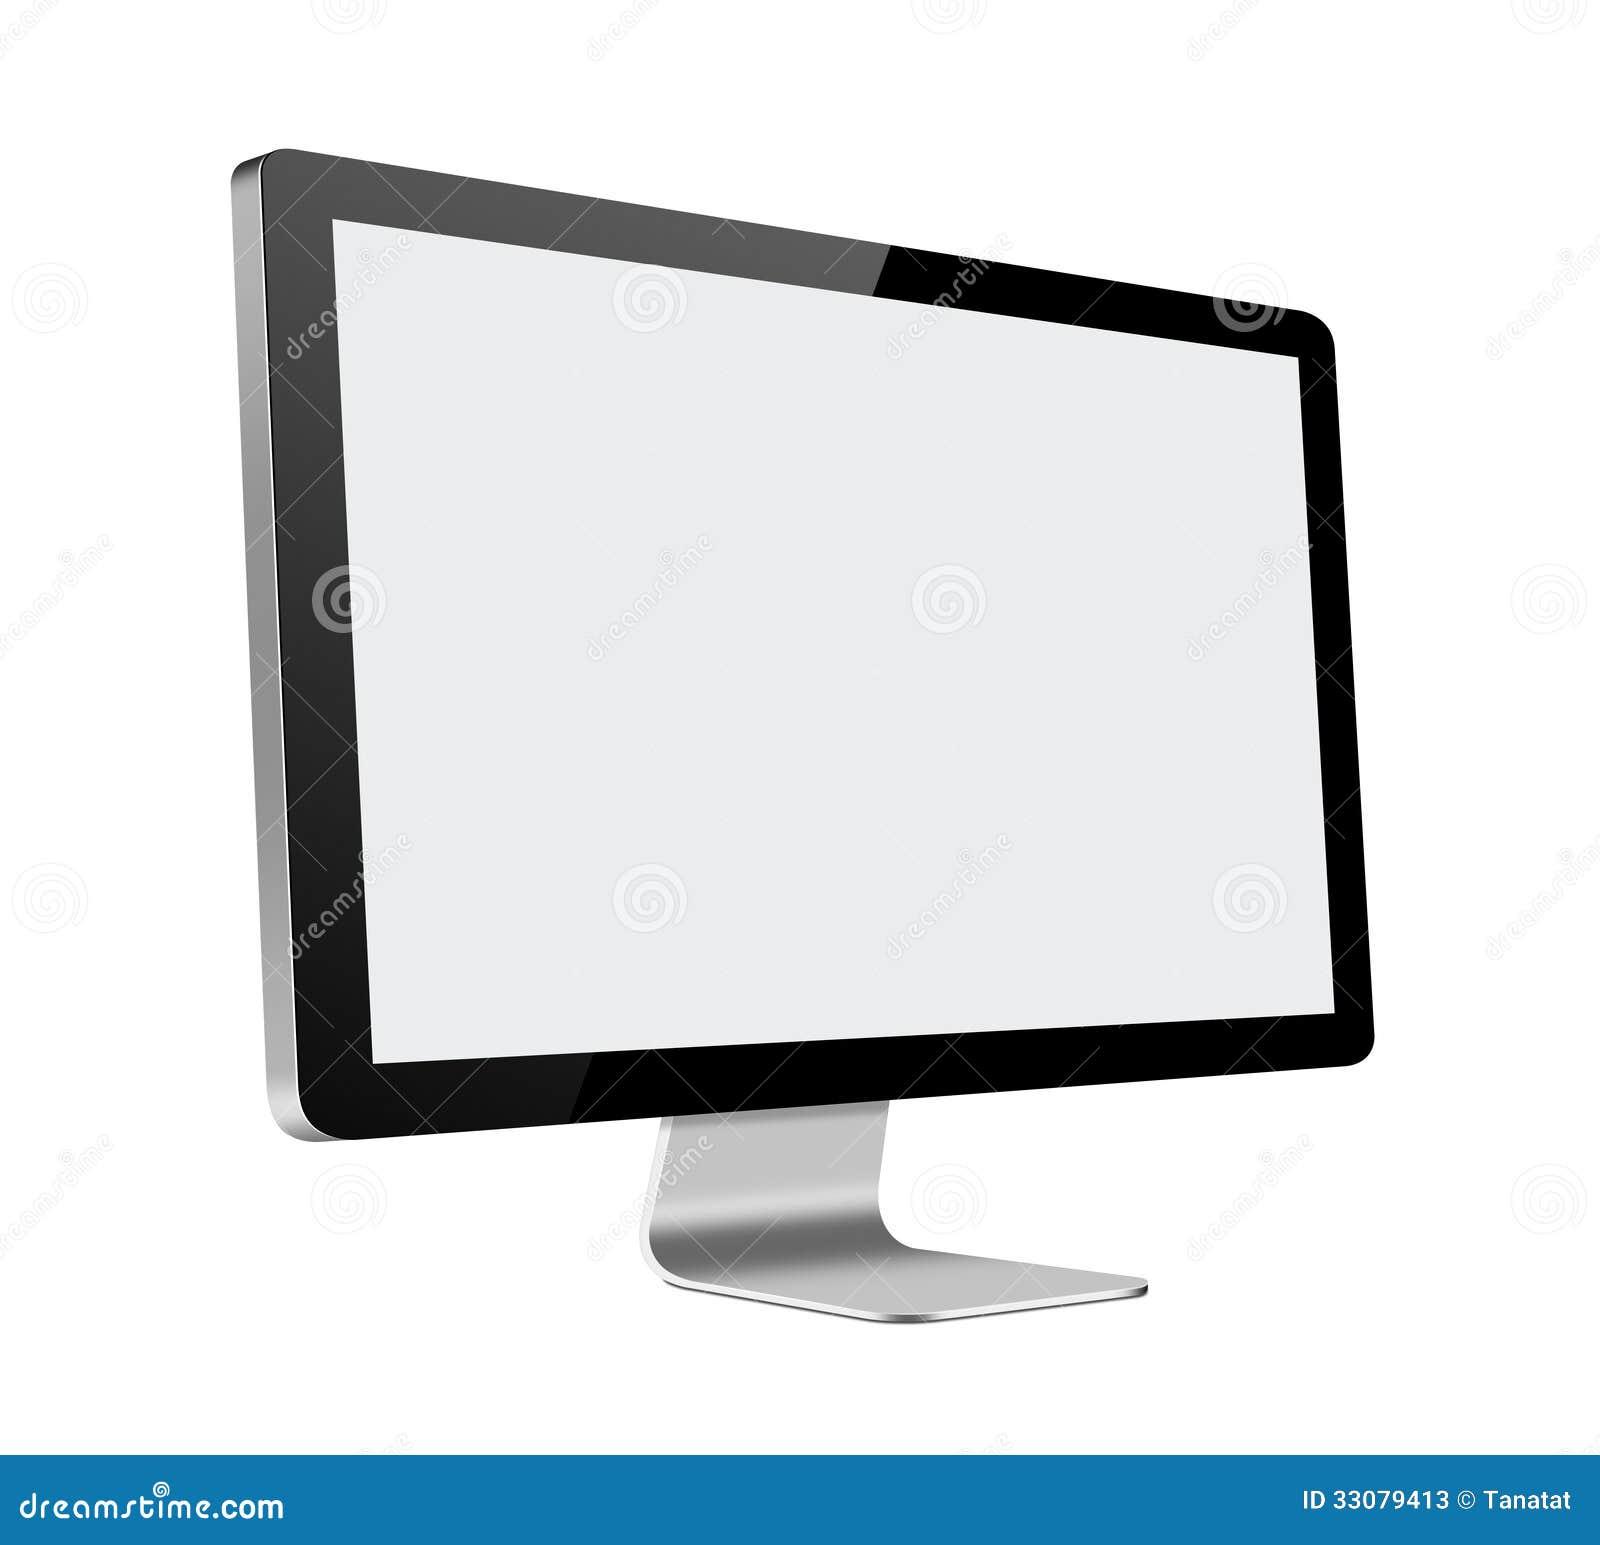 flat panel display in computer graphics pdf